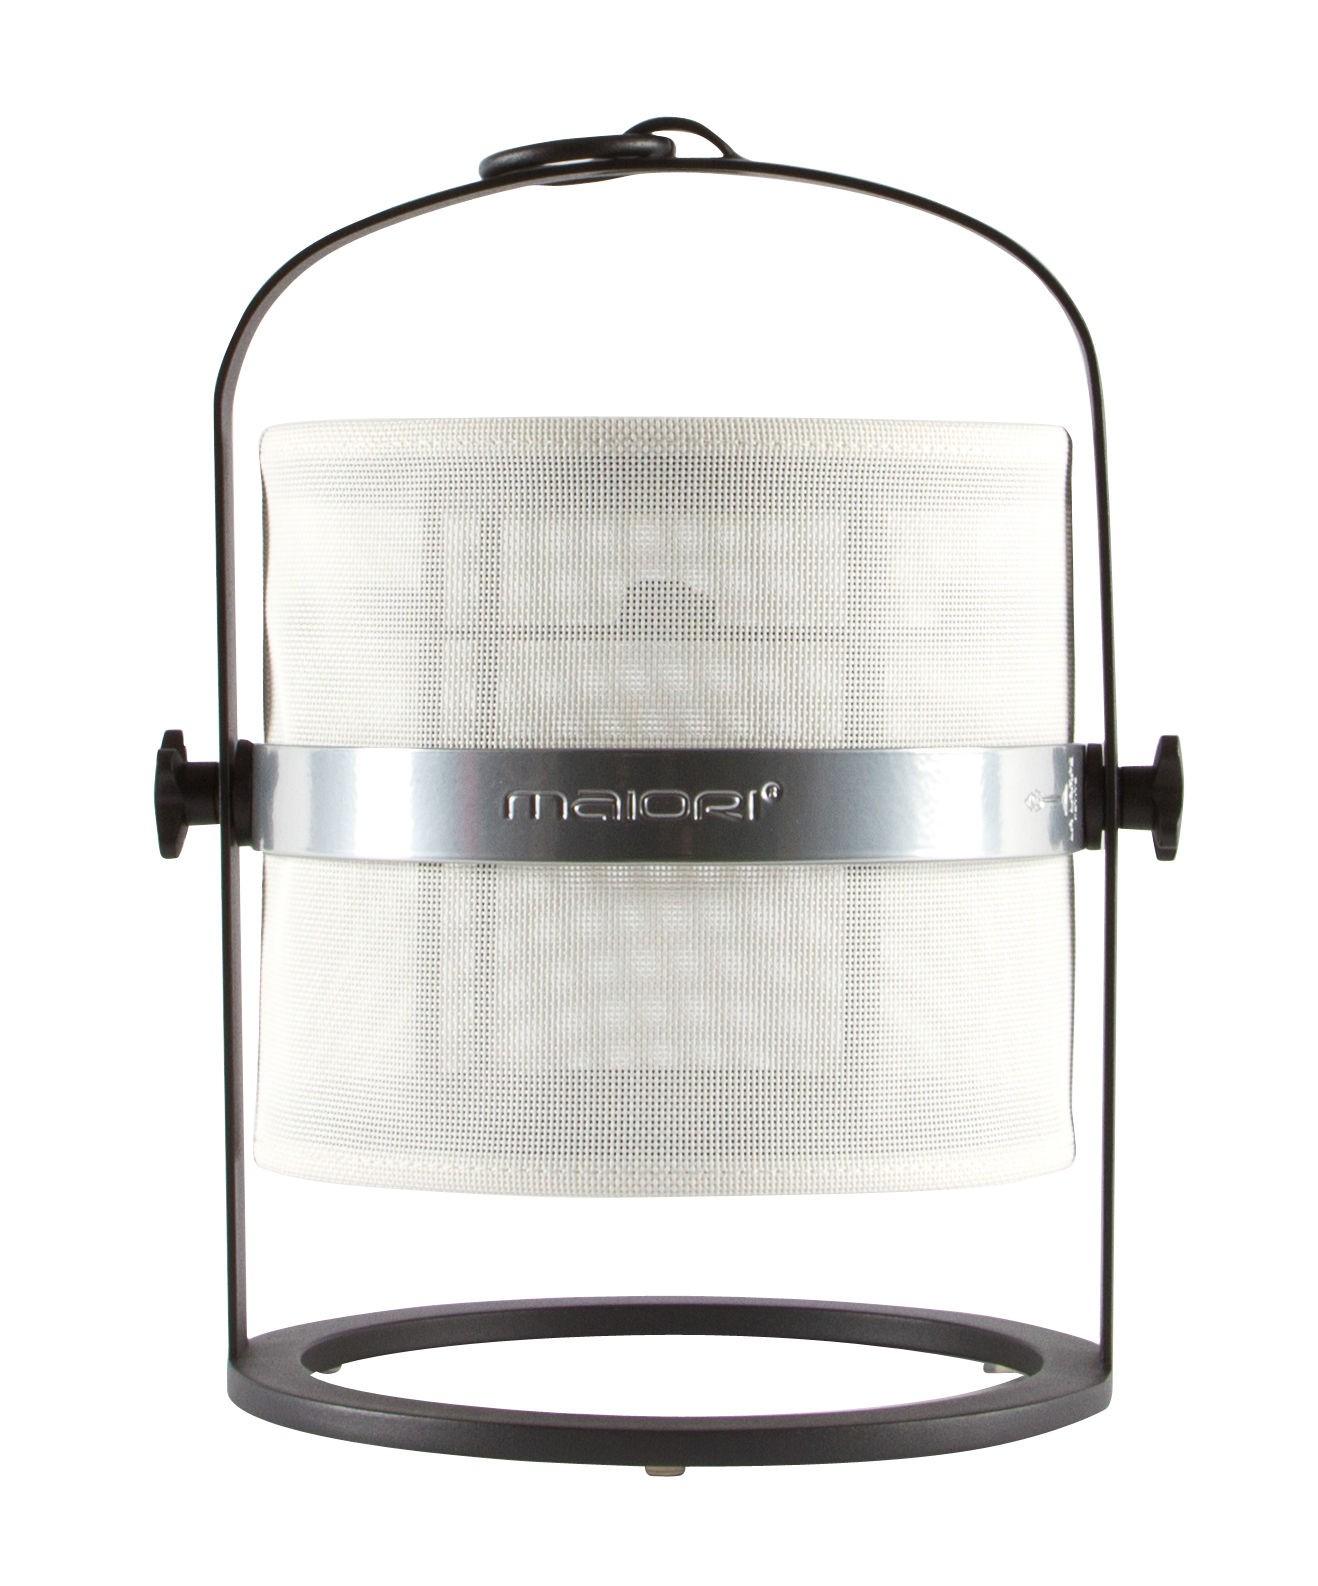 la lampe petite de maiori blanc structure noir. Black Bedroom Furniture Sets. Home Design Ideas